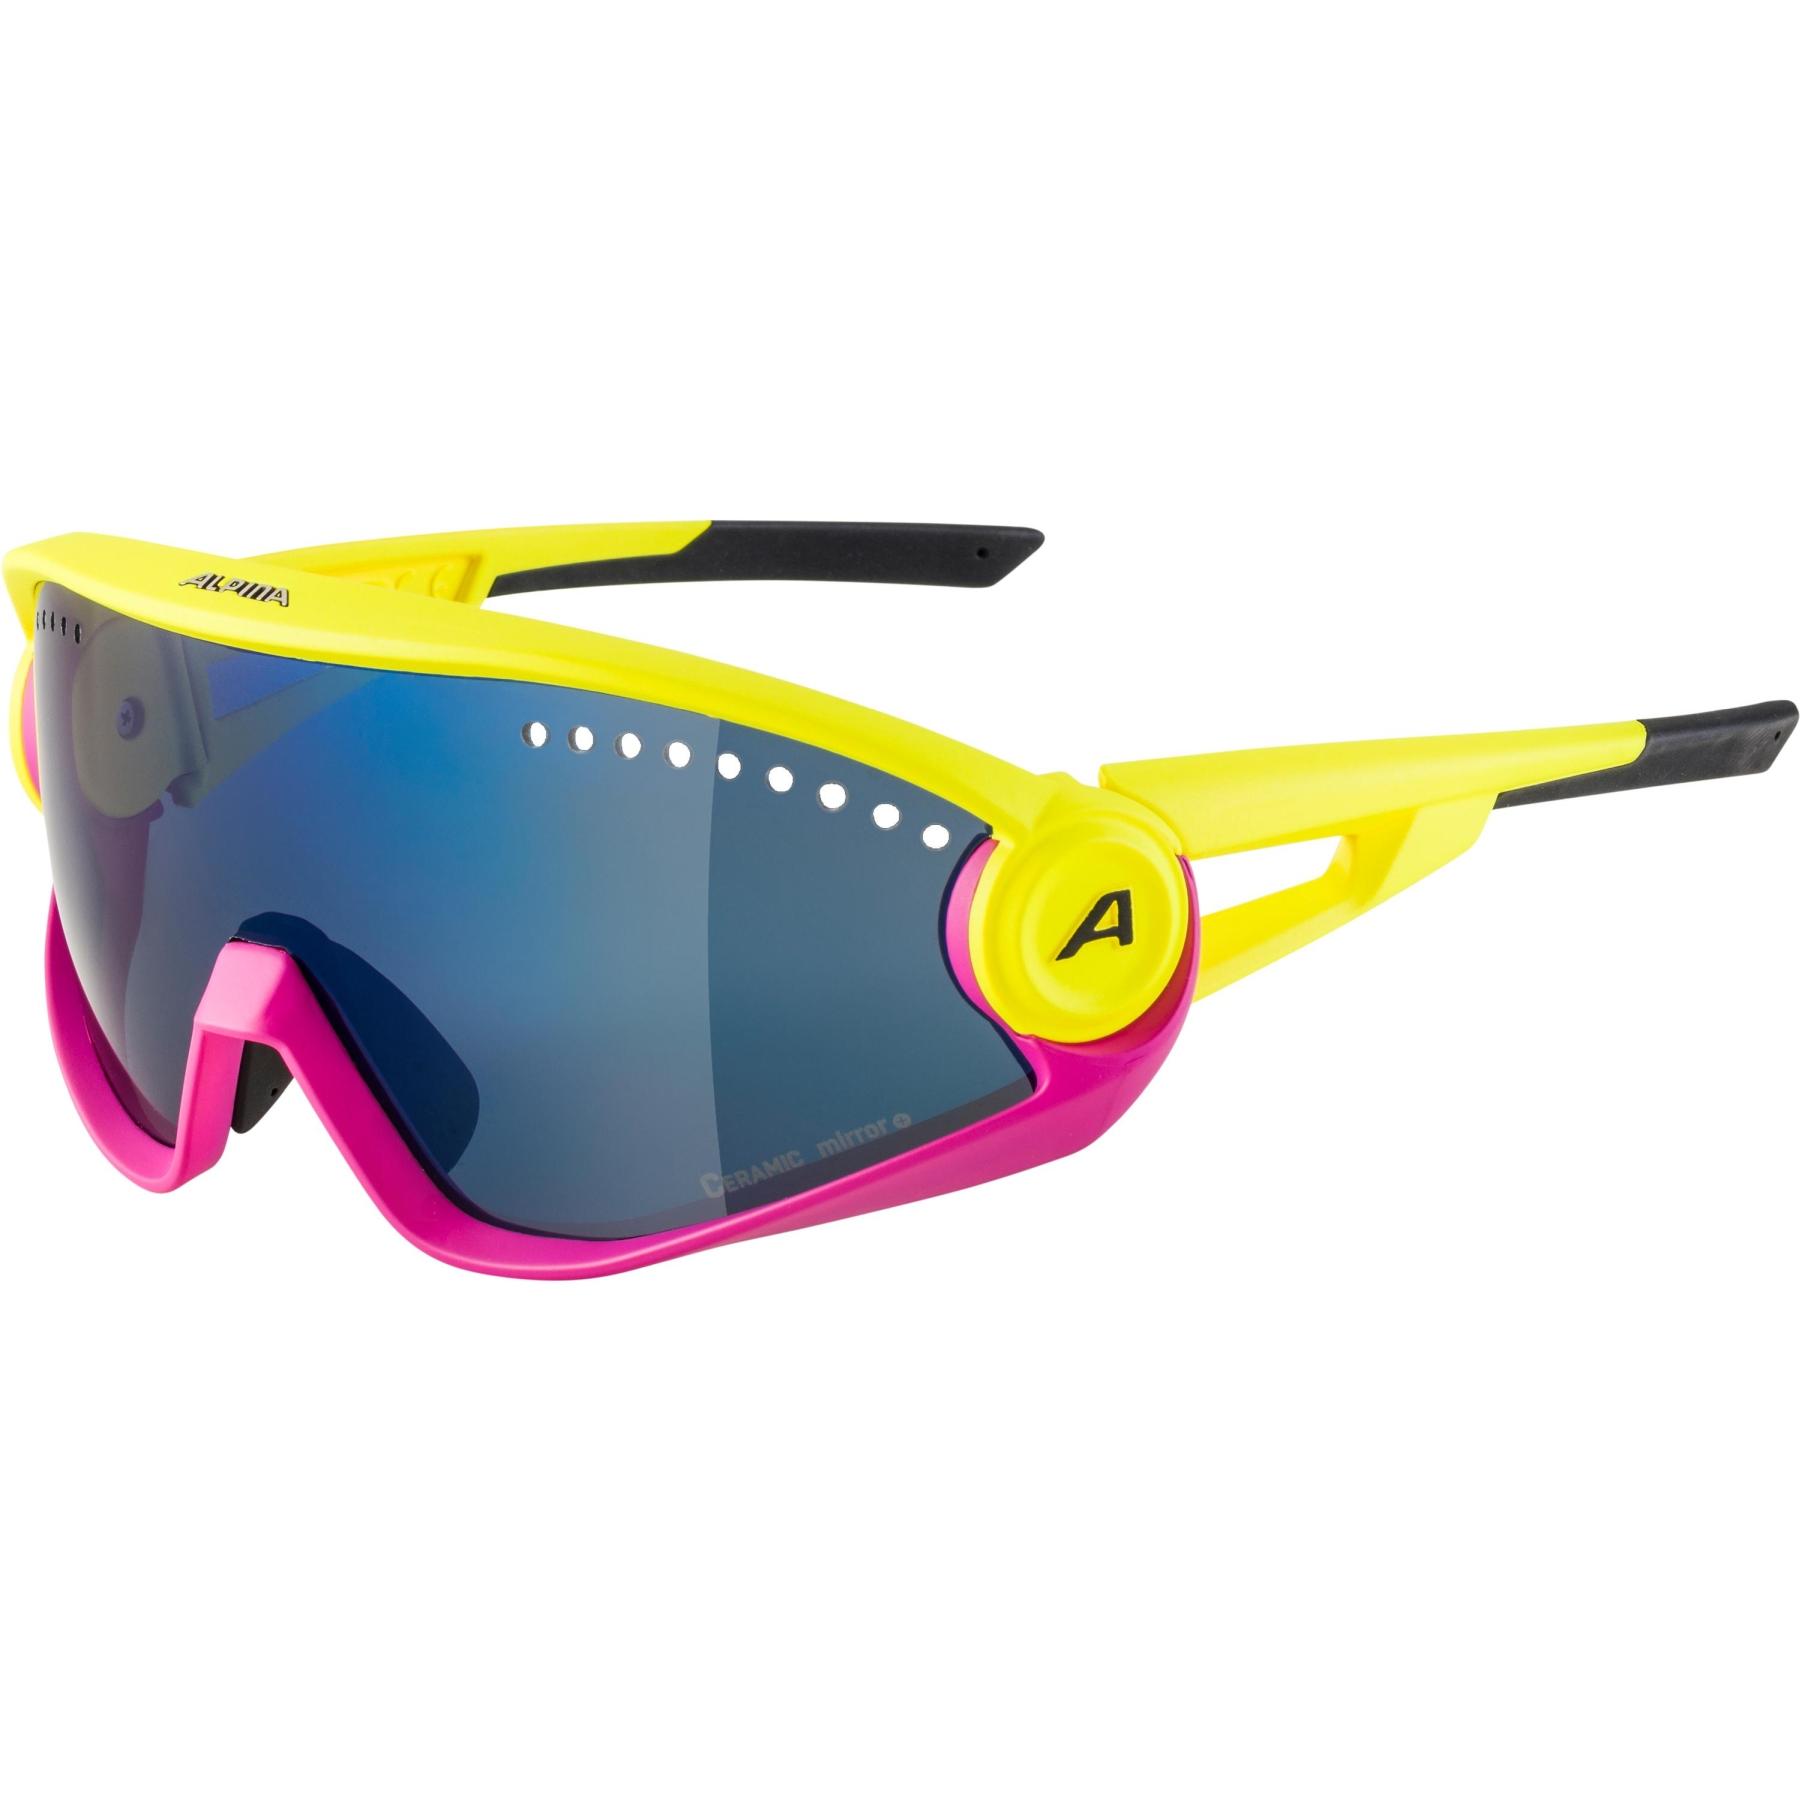 Alpina 5W1NG CM+ Glasses - pineapple-magenta  / blue mirror